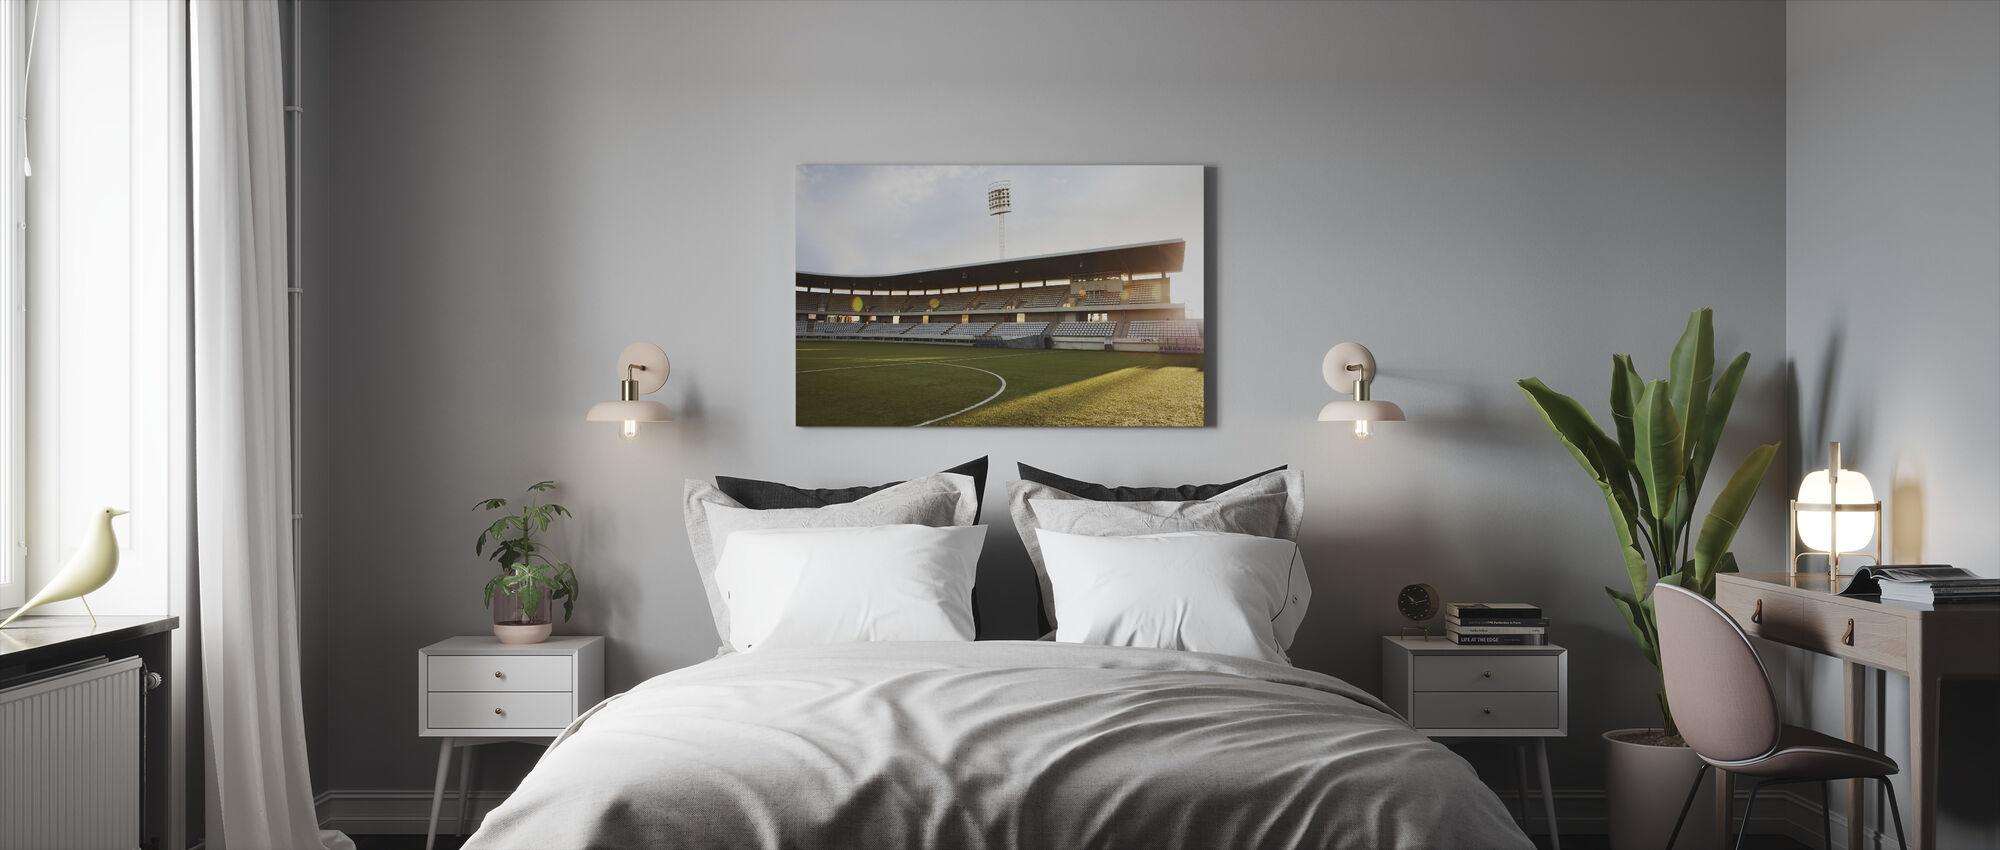 Soccer Field in Barcelona - Canvas print - Bedroom